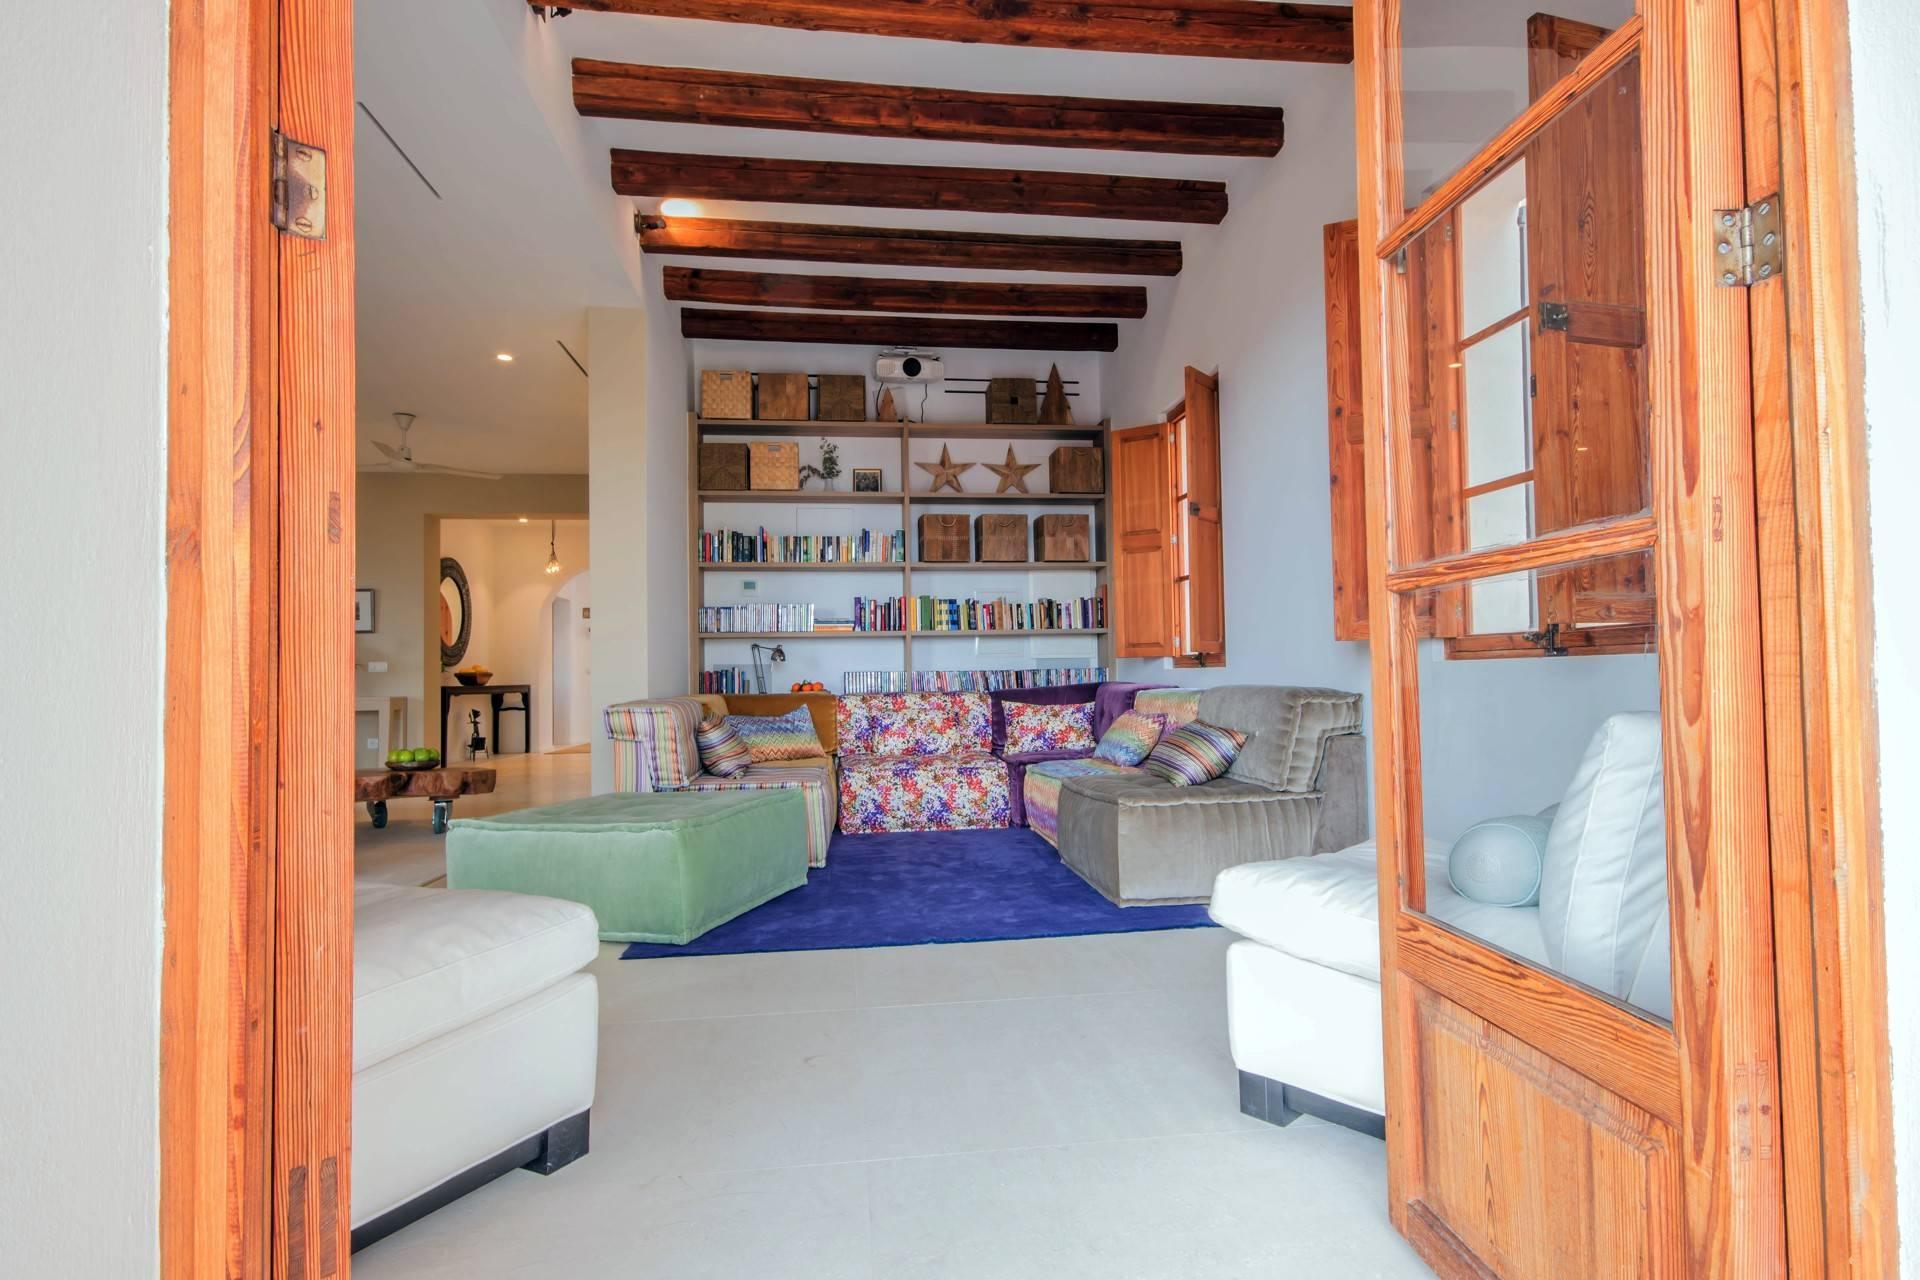 01-257 Luxus Ferienhaus Mallorca Südwesten Bild 8